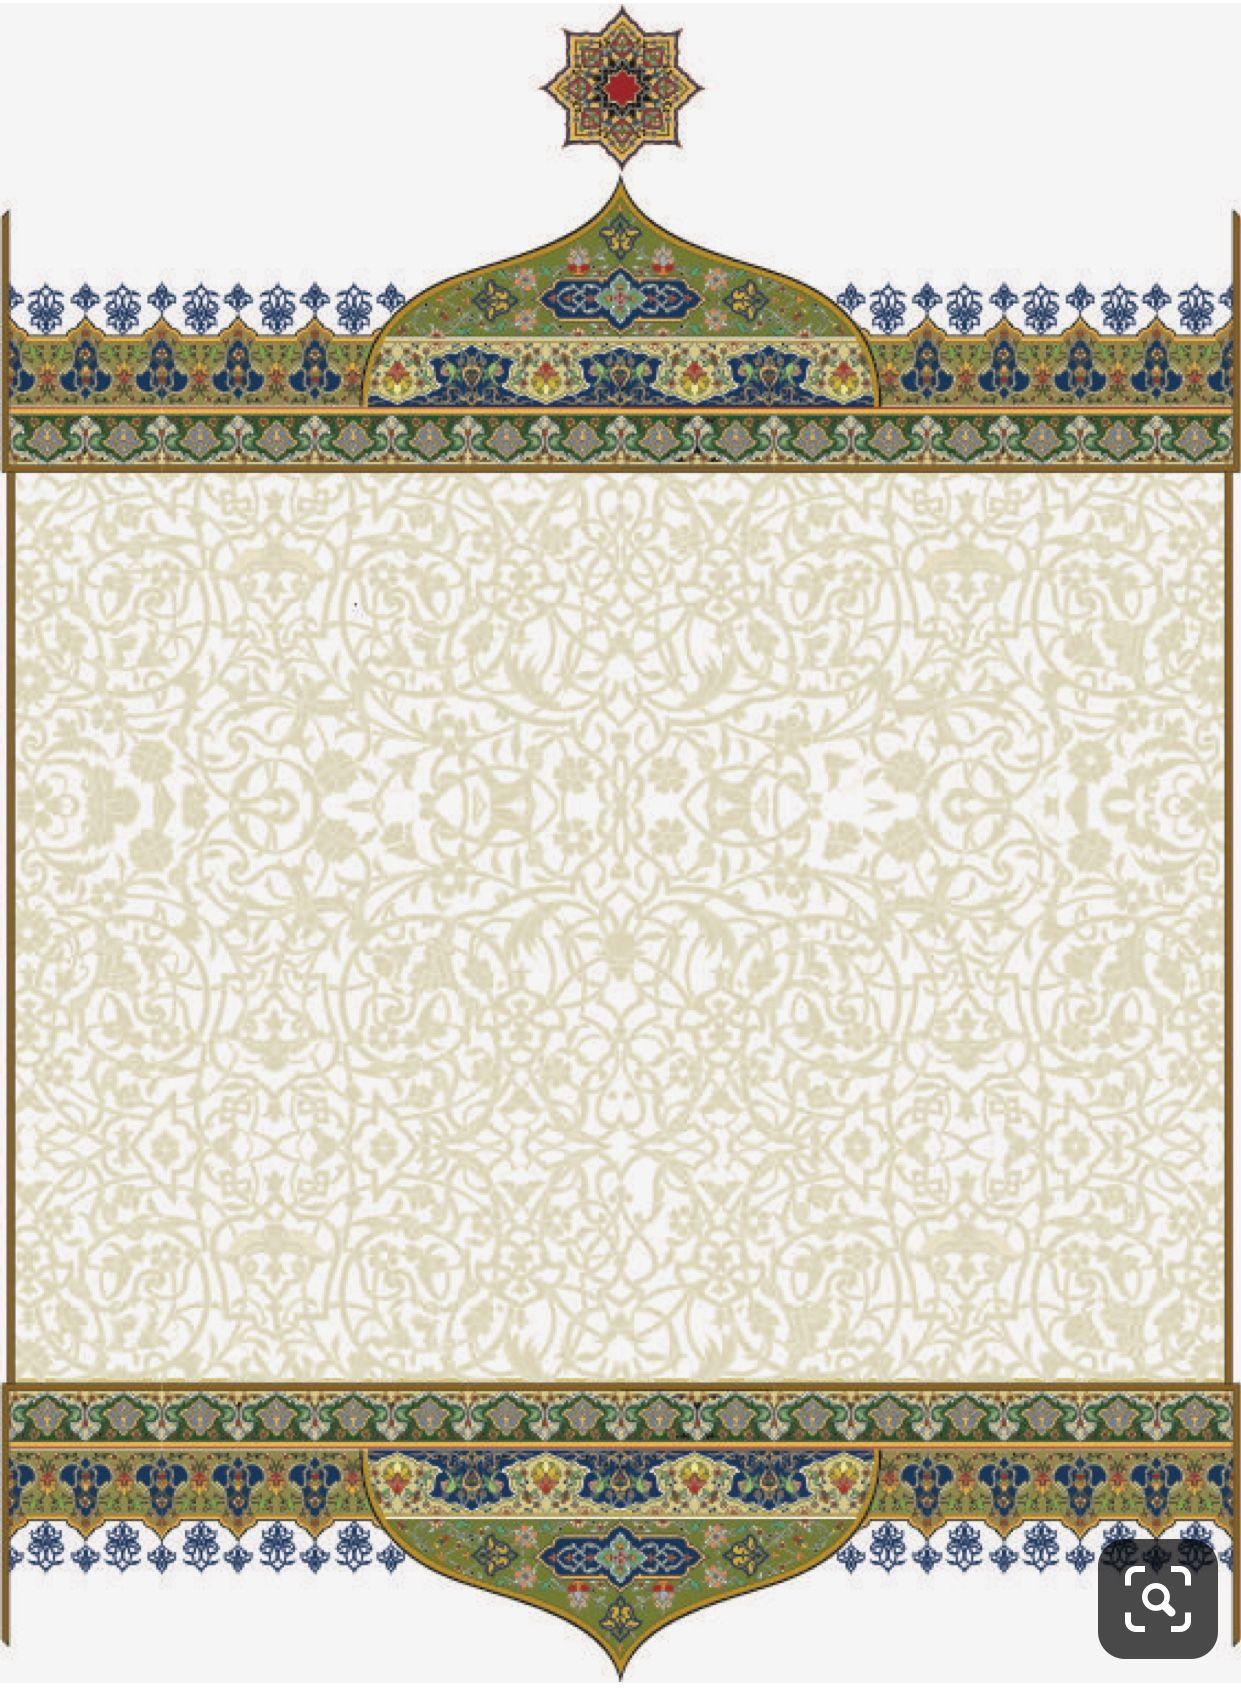 Pin By Shaheen Perwaz On Quick Saves Poster Background Design Islamic Art Islamic Art Pattern